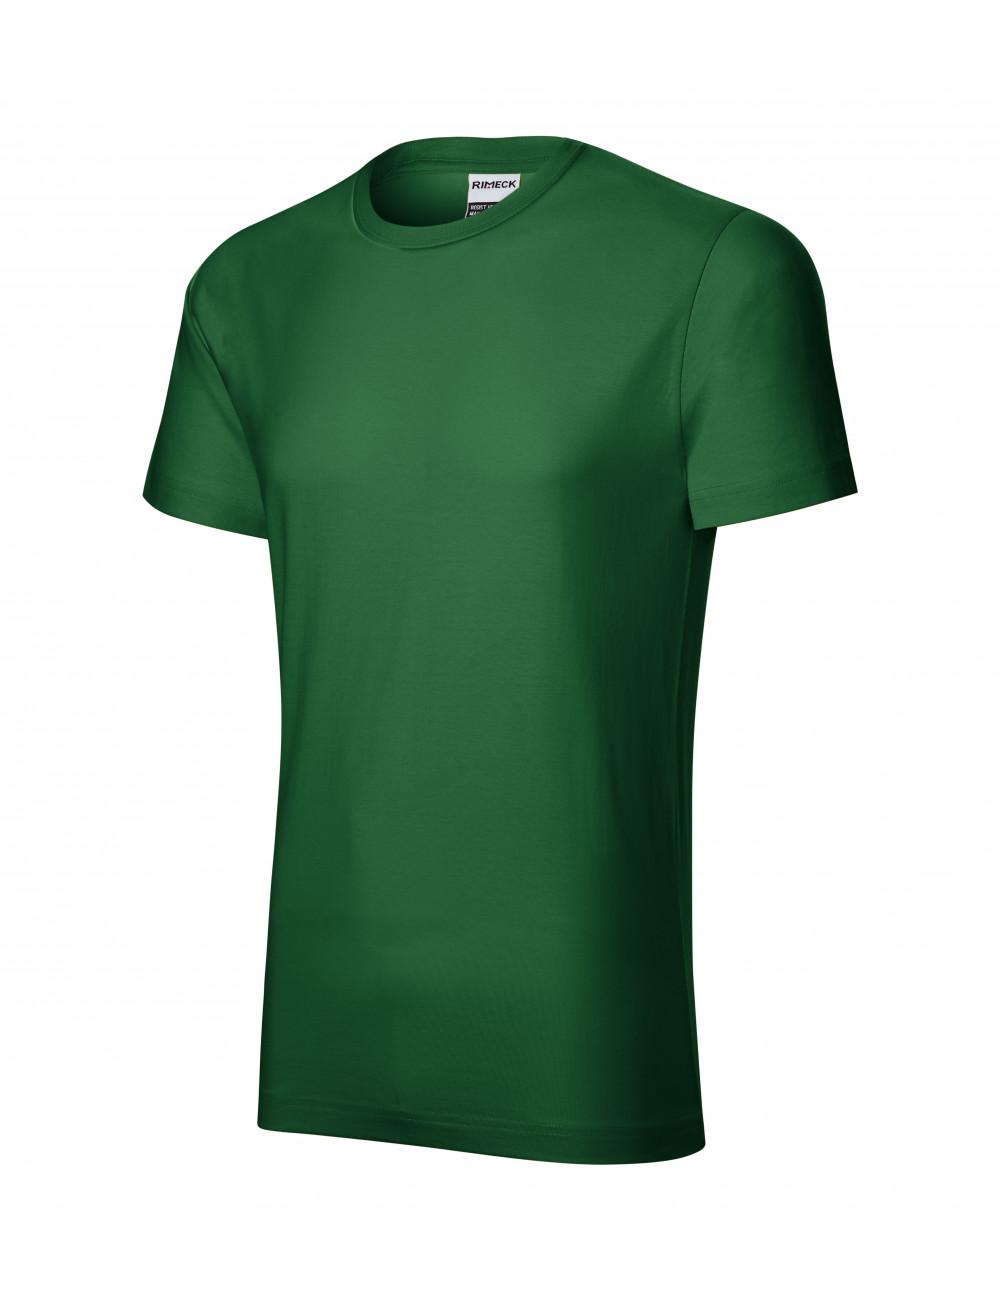 Adler RIMECK Koszulka męska Resist R01 zieleń butelkowa